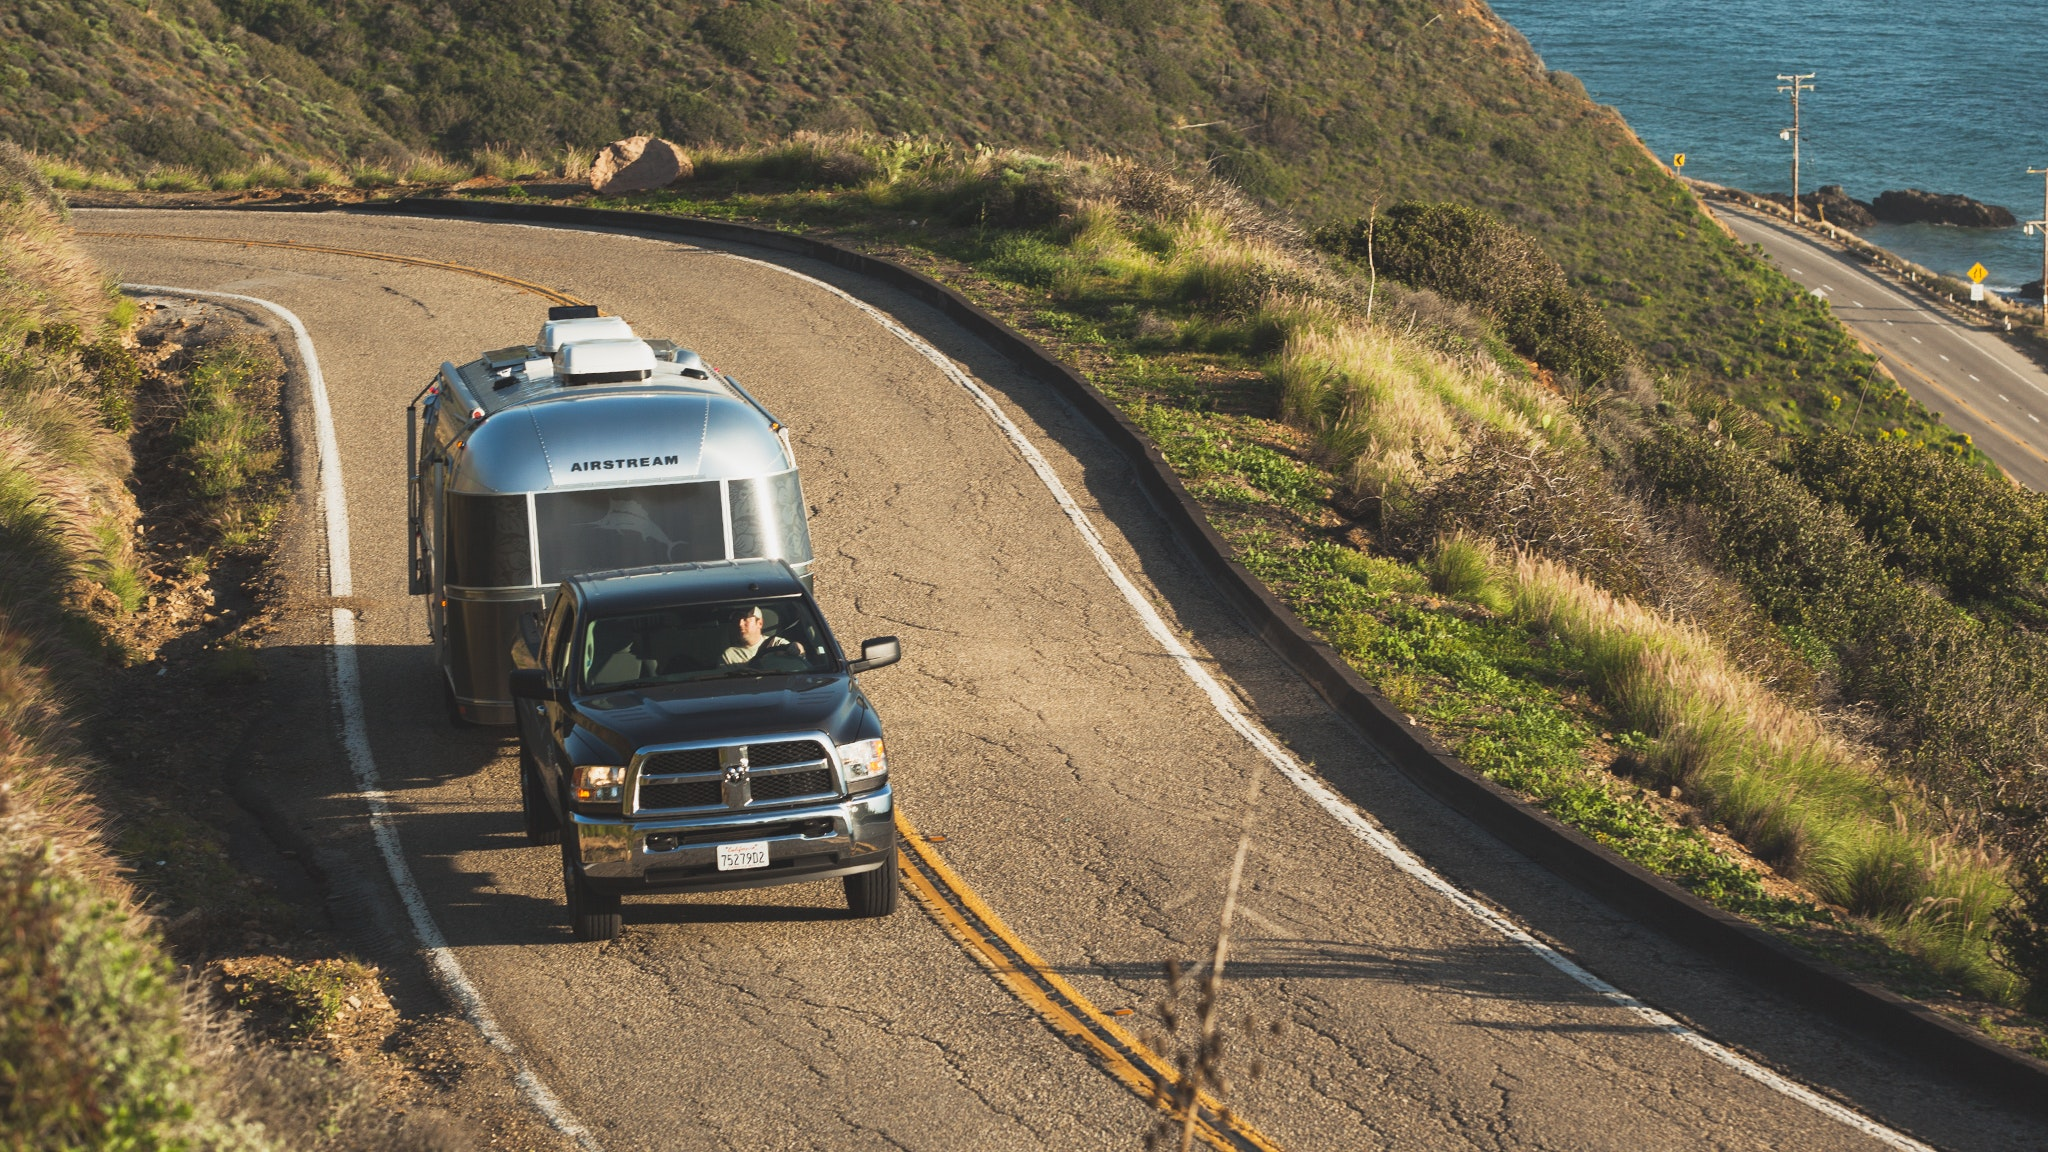 Airstream-Summer-Travel-Plan-Blog-Header